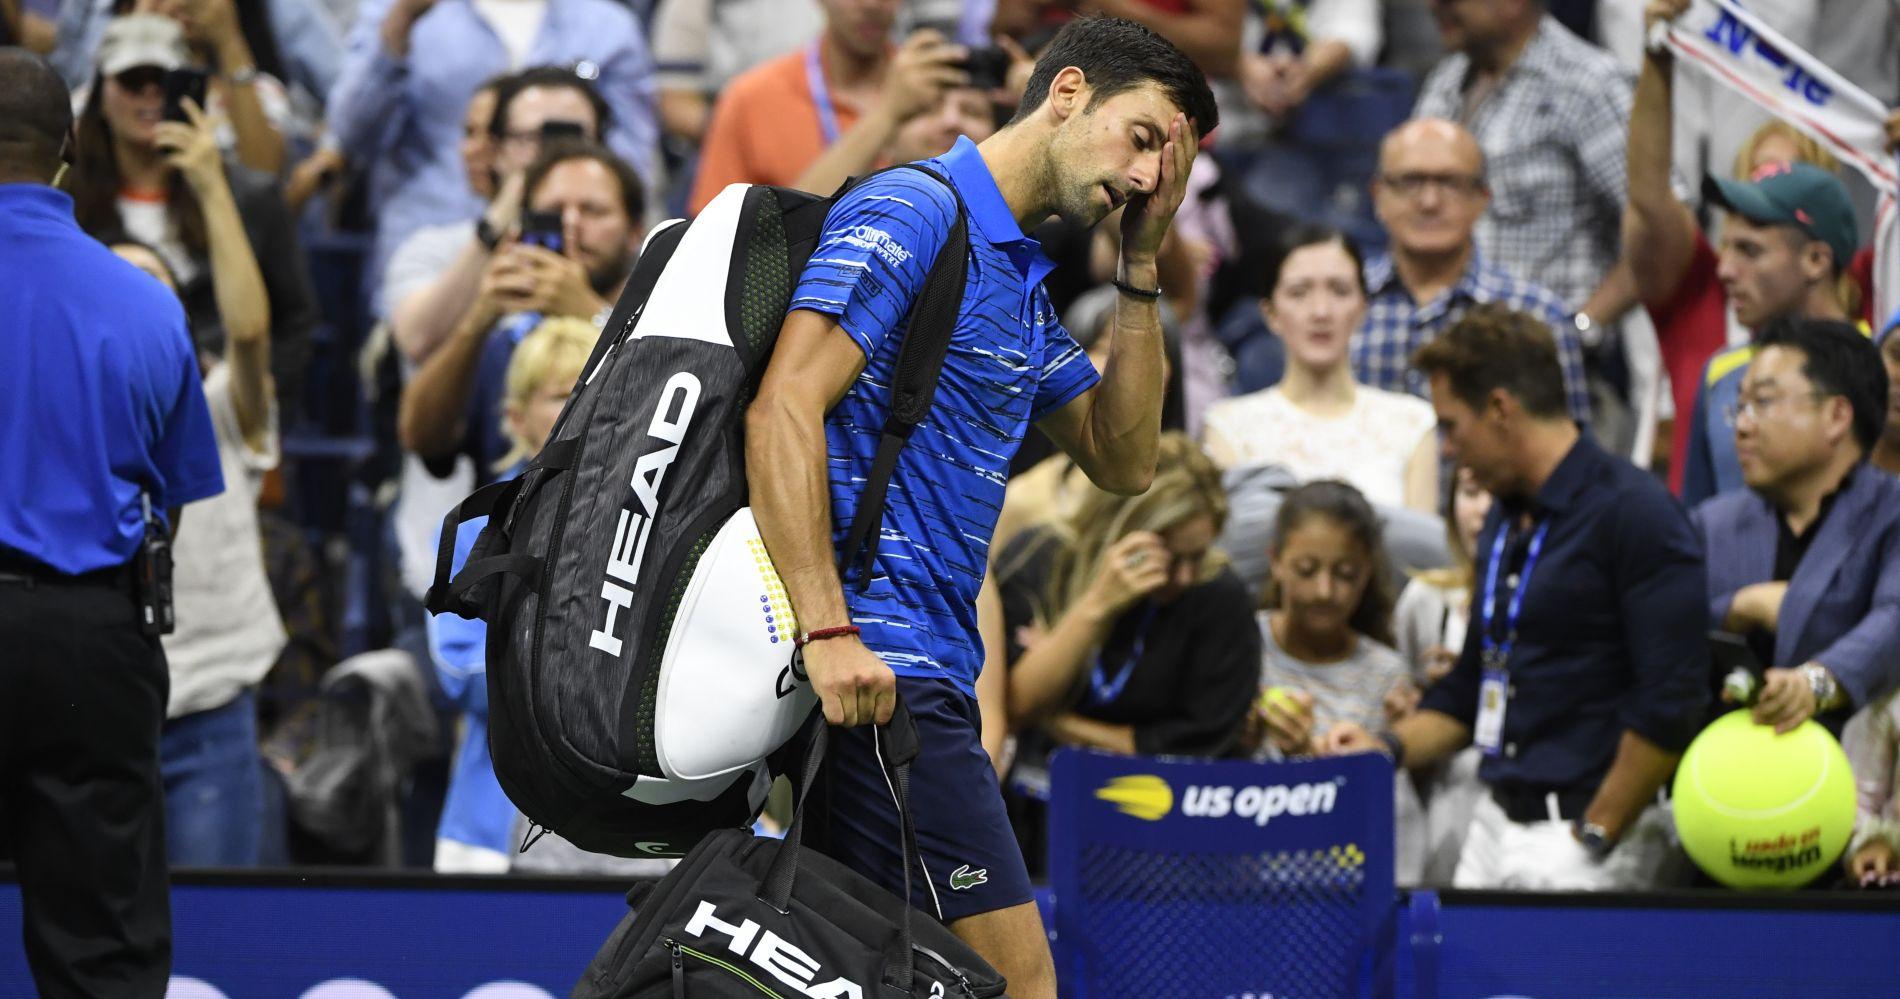 Novak Djokovic - US Open 2019